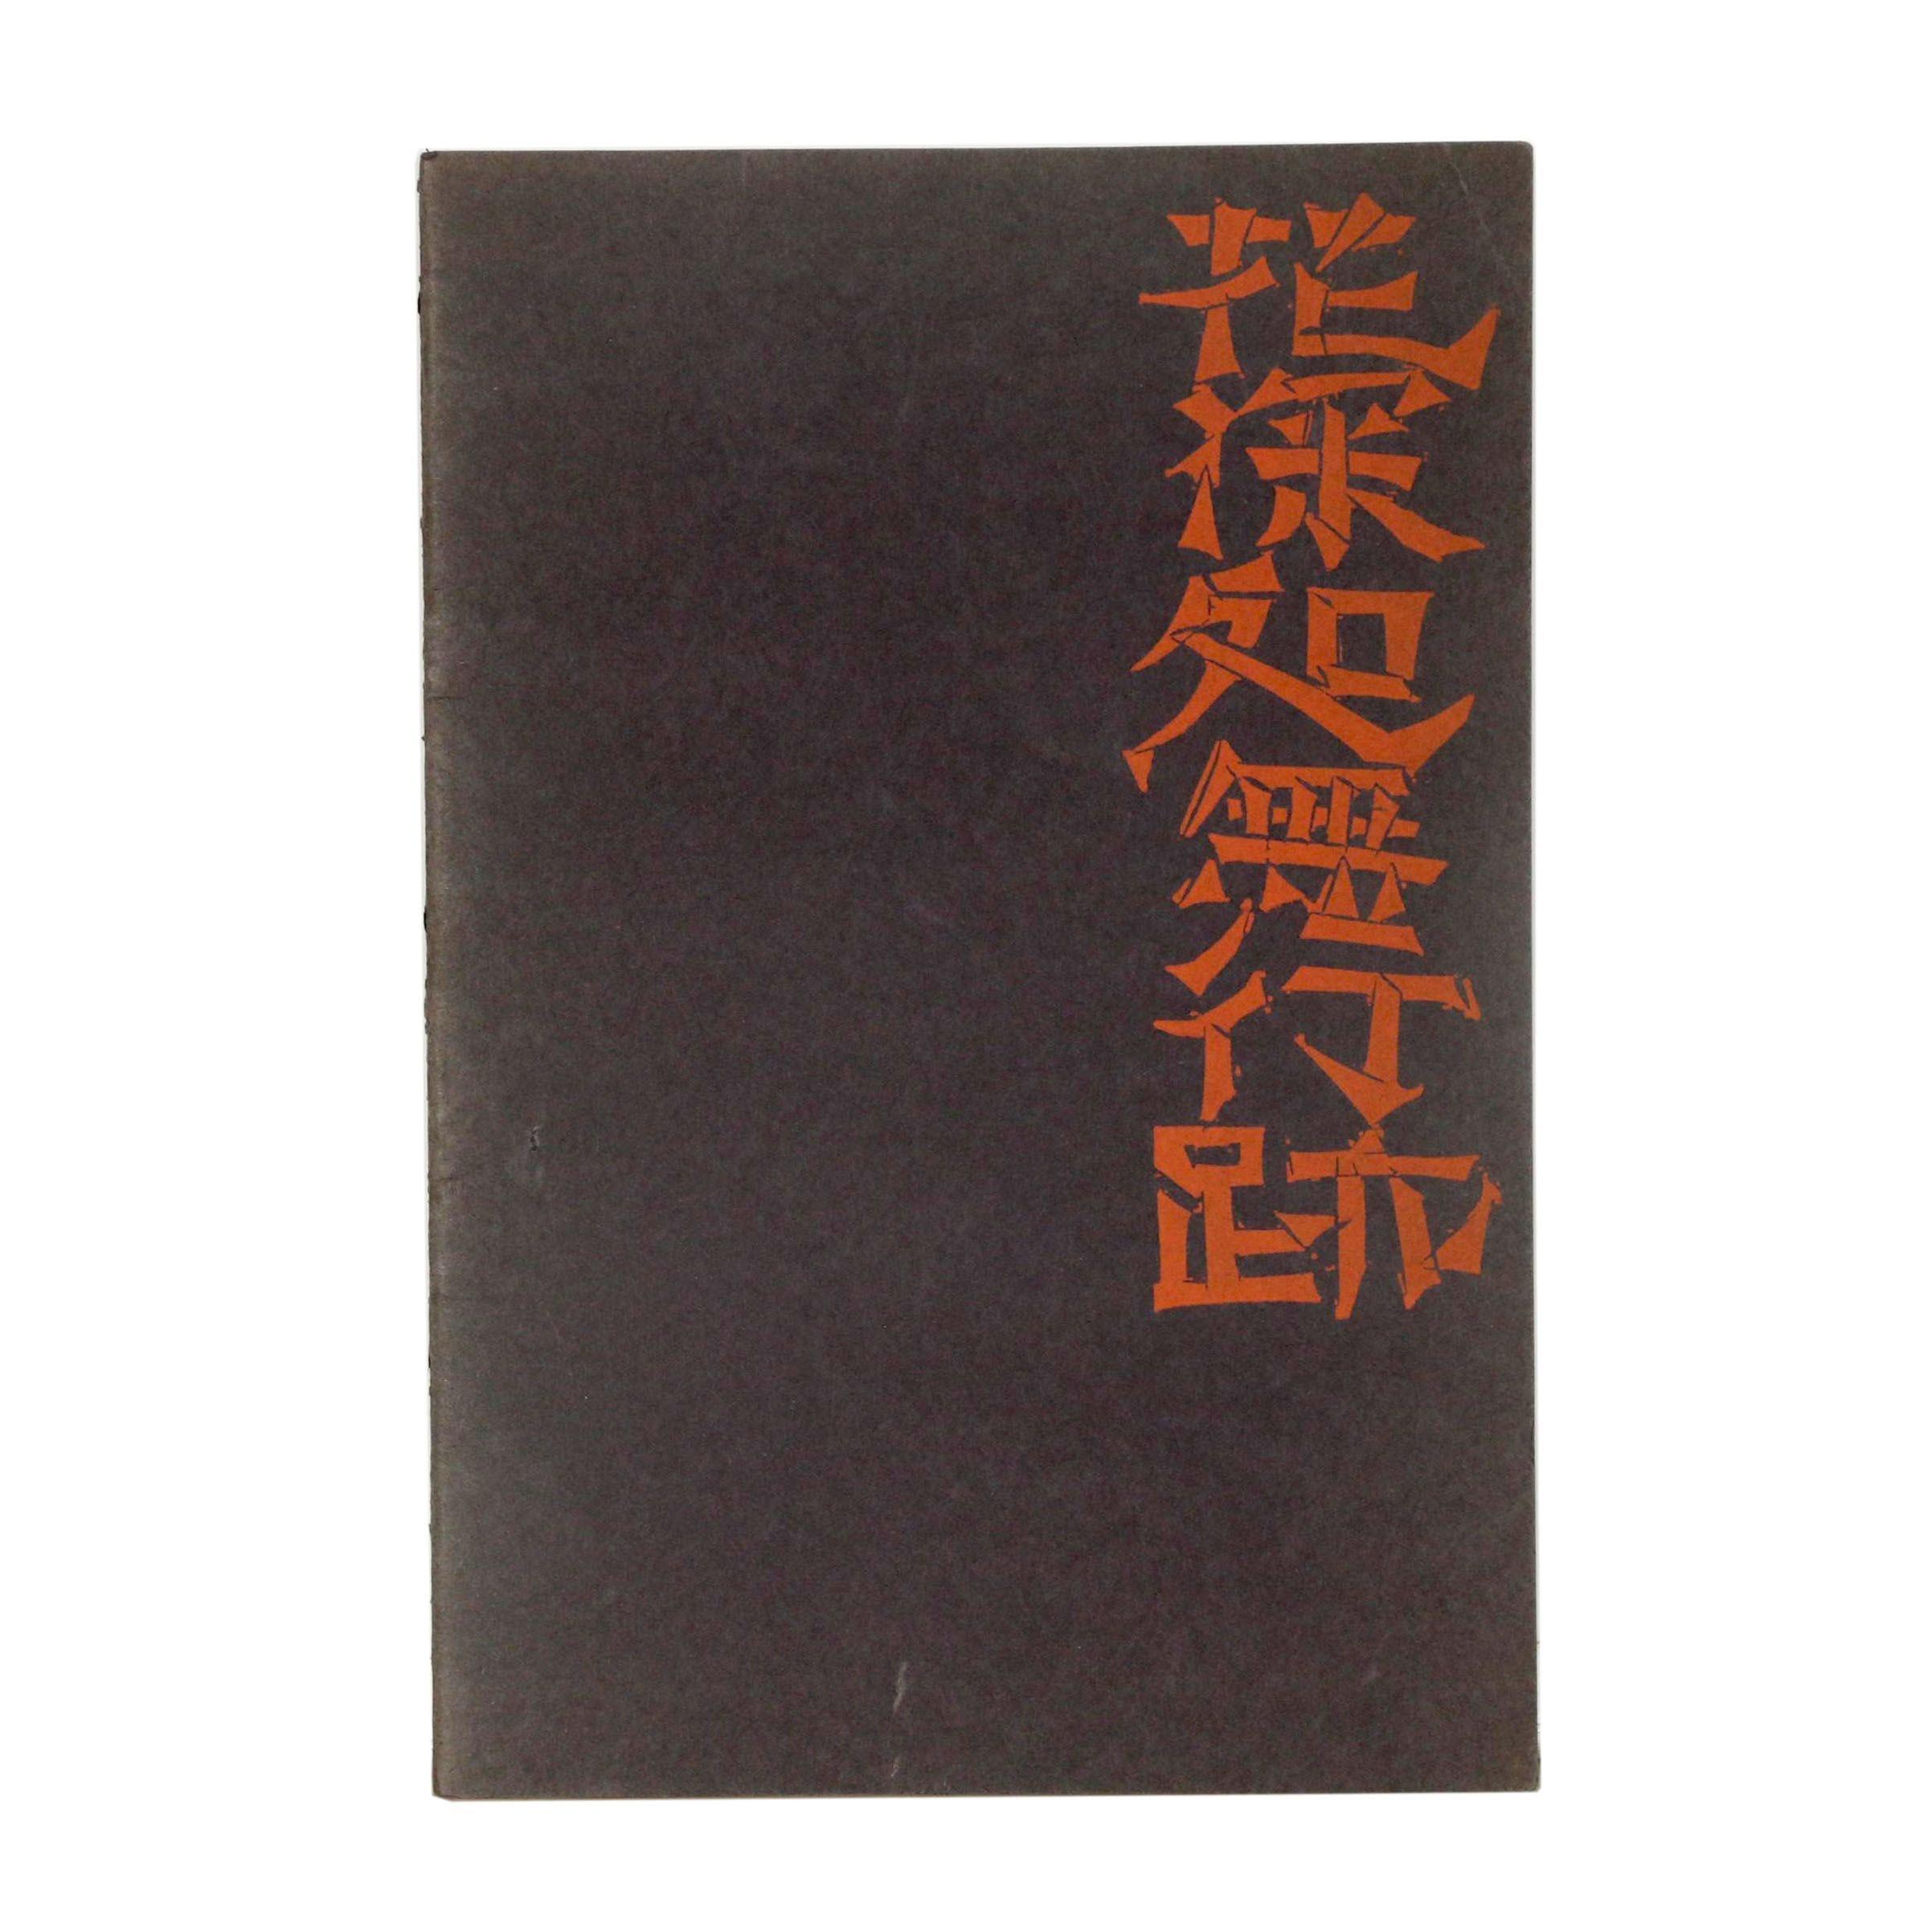 "1961 ""Shikō Munakata: The 'Way' of the Woodcut"""